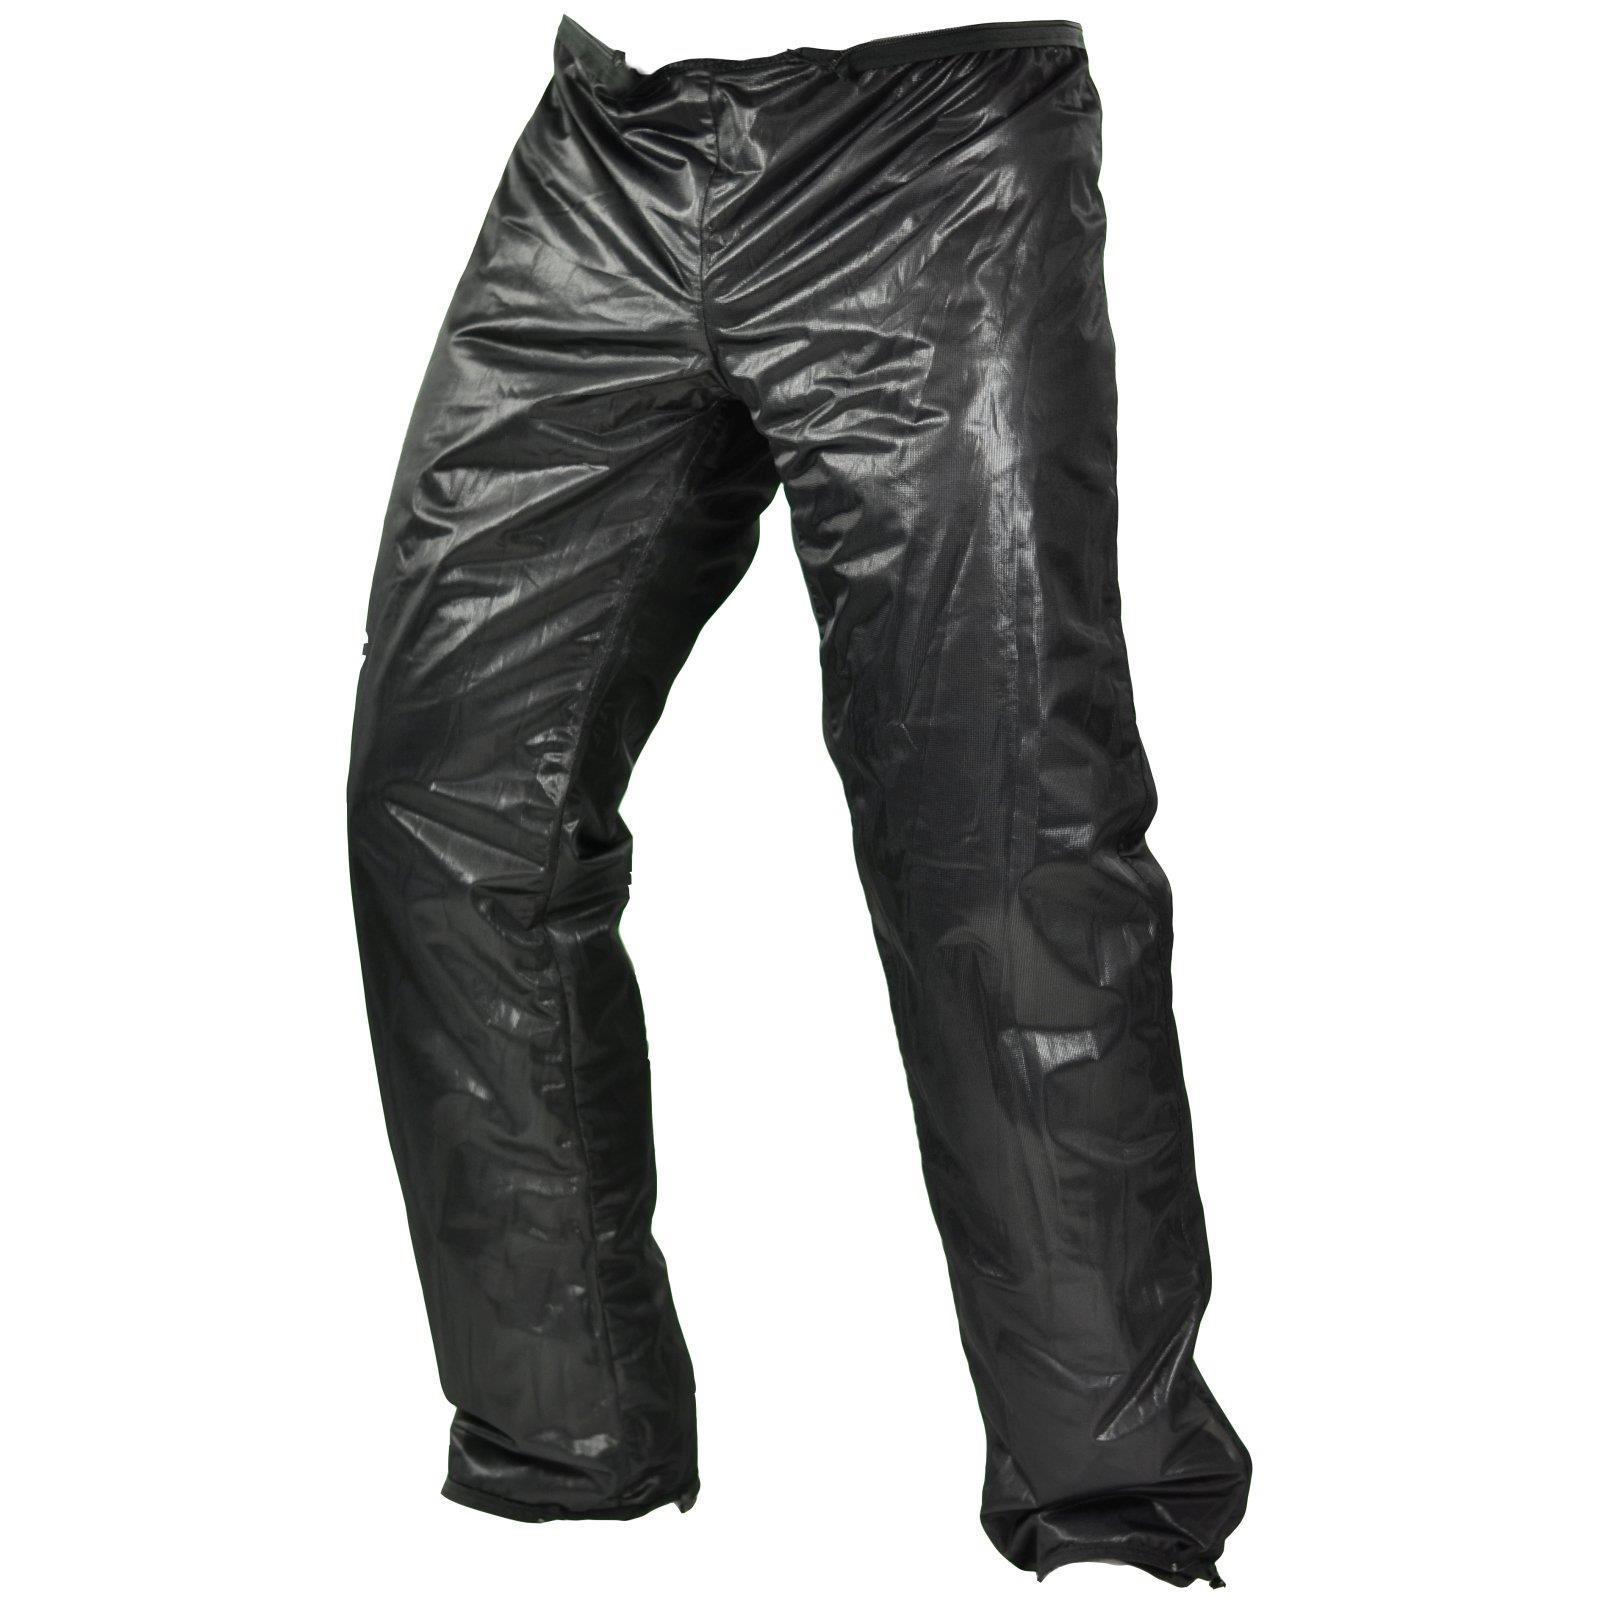 Trilobite-Pantaloni-Moto-Jeans-Abbigliamento-Parado-MICAS-URBAN-DUAL-PANTS-ACID miniatura 28